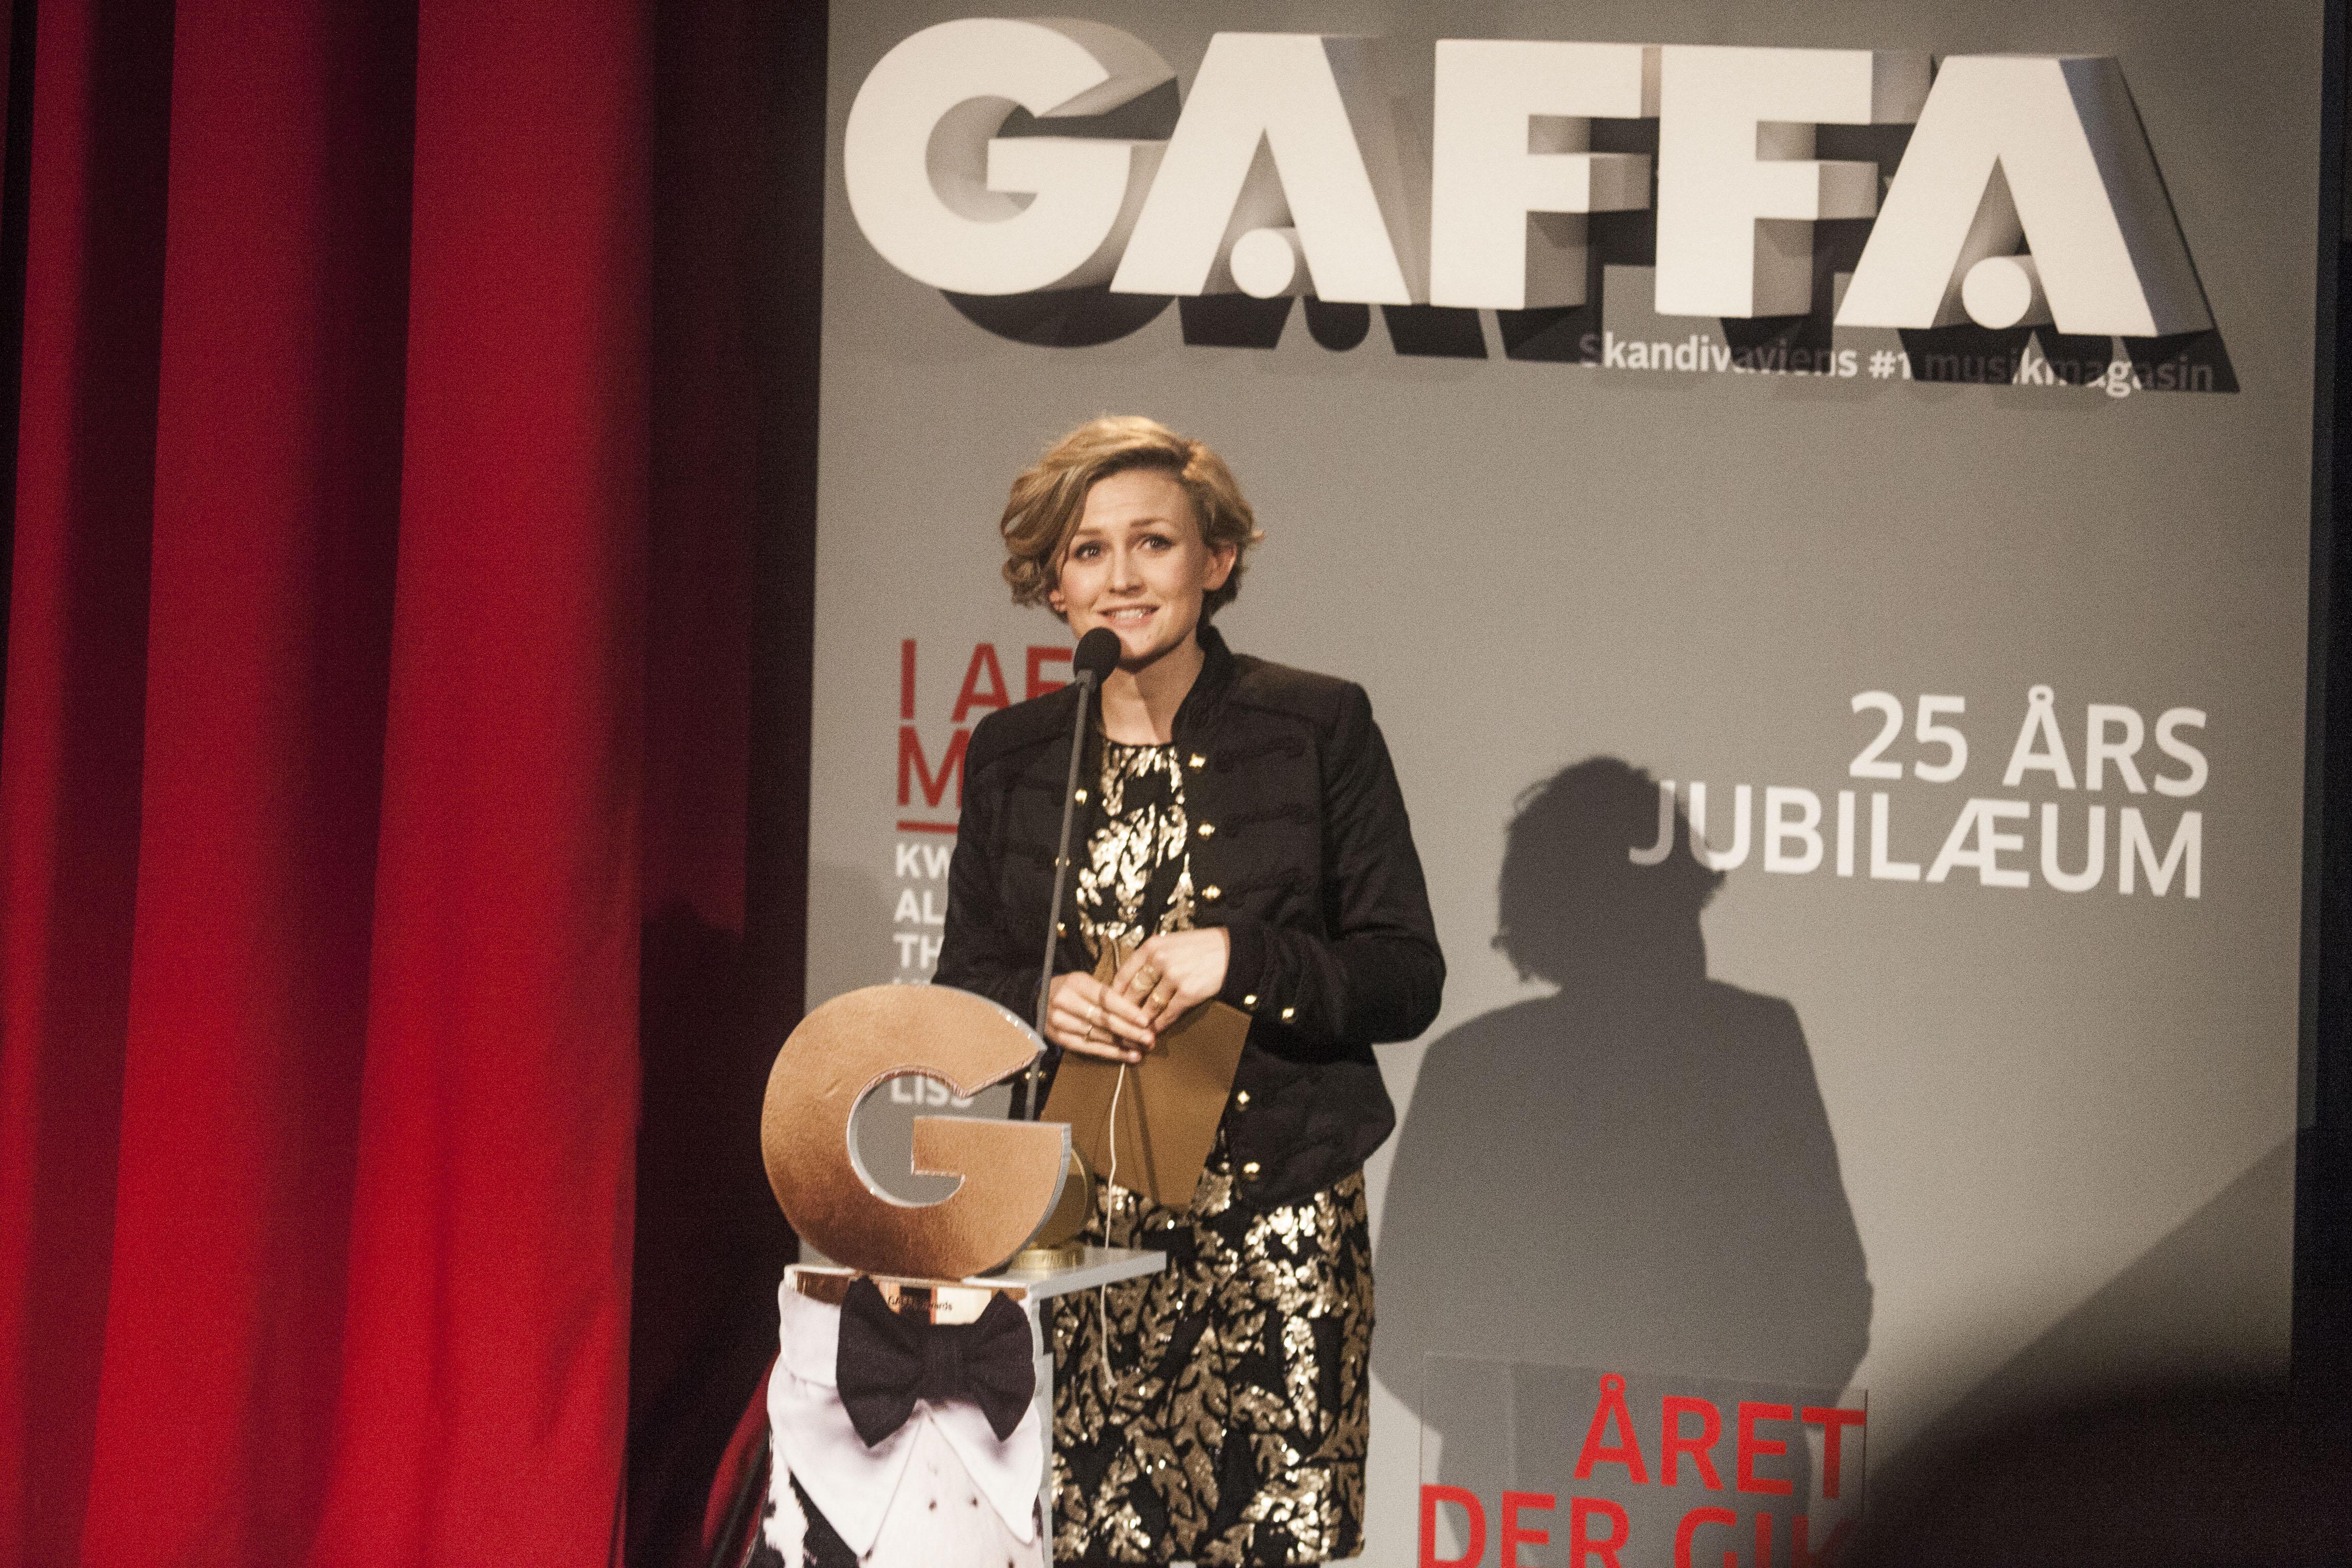 GAFFAprisen2015_HelenaLundquist_mindre_13